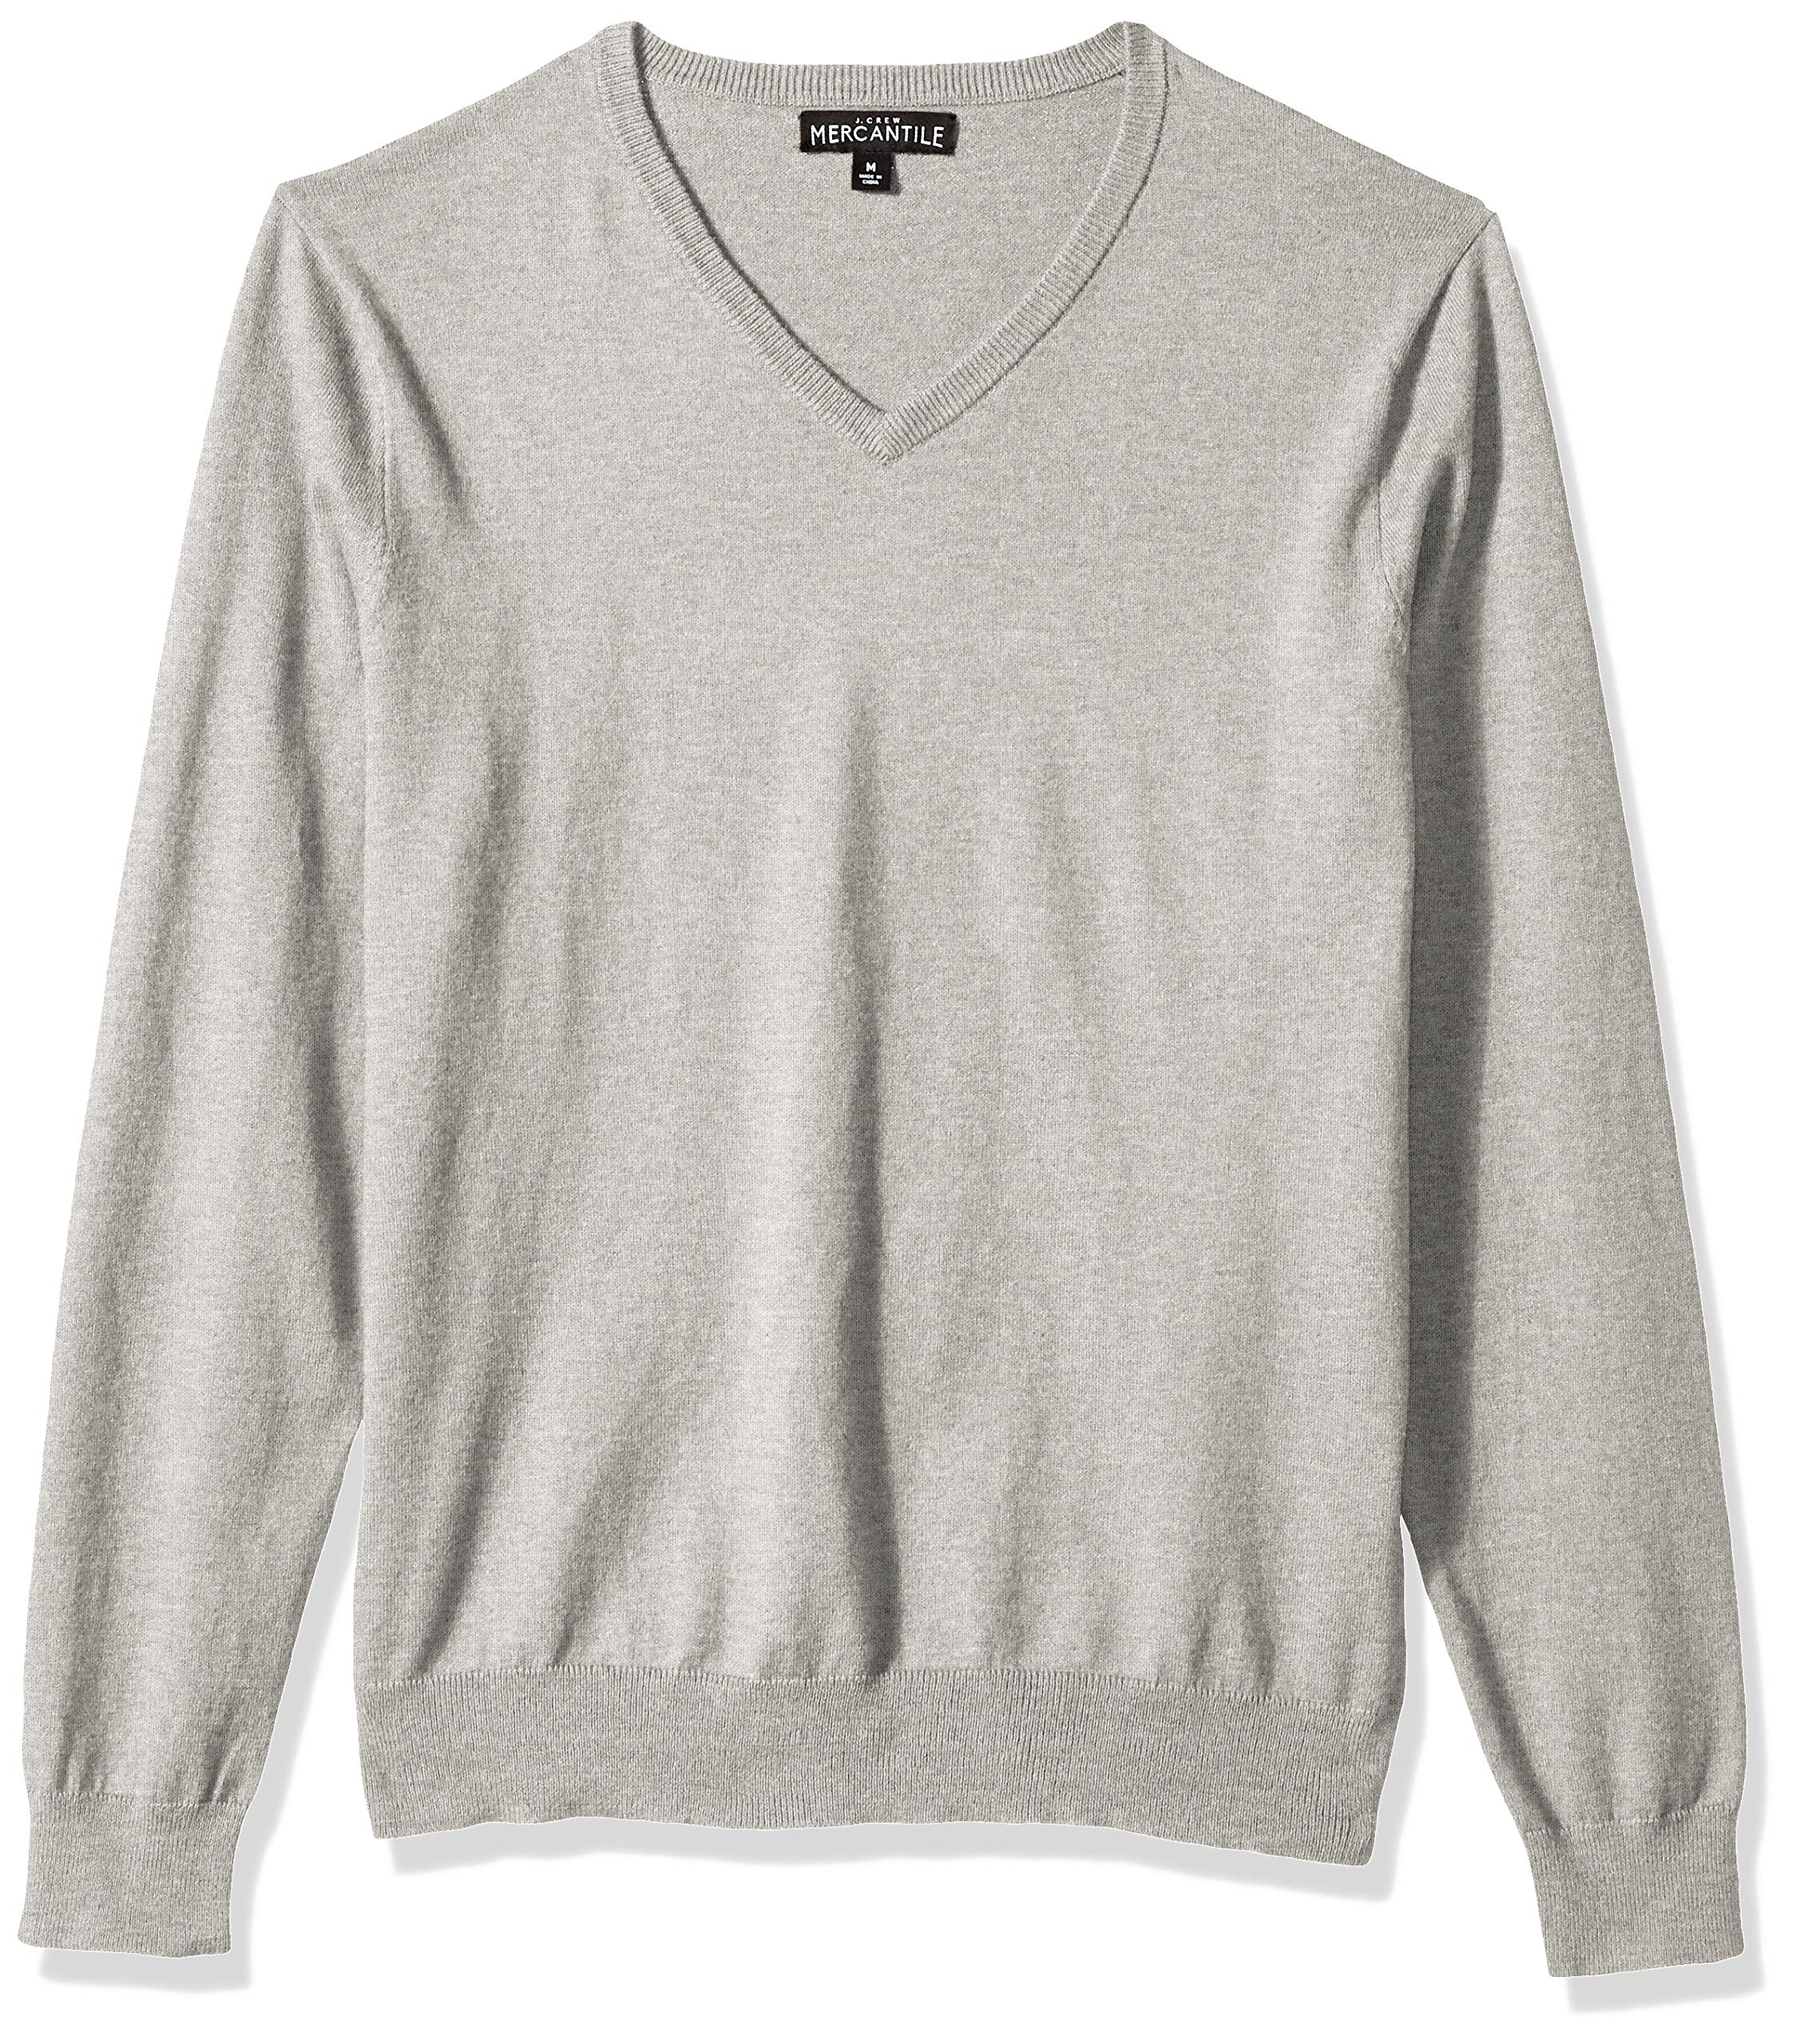 J.Crew Mercantile Men's Long-Sleeve Cotton V-Neck Sweater, Heather Platinum, M